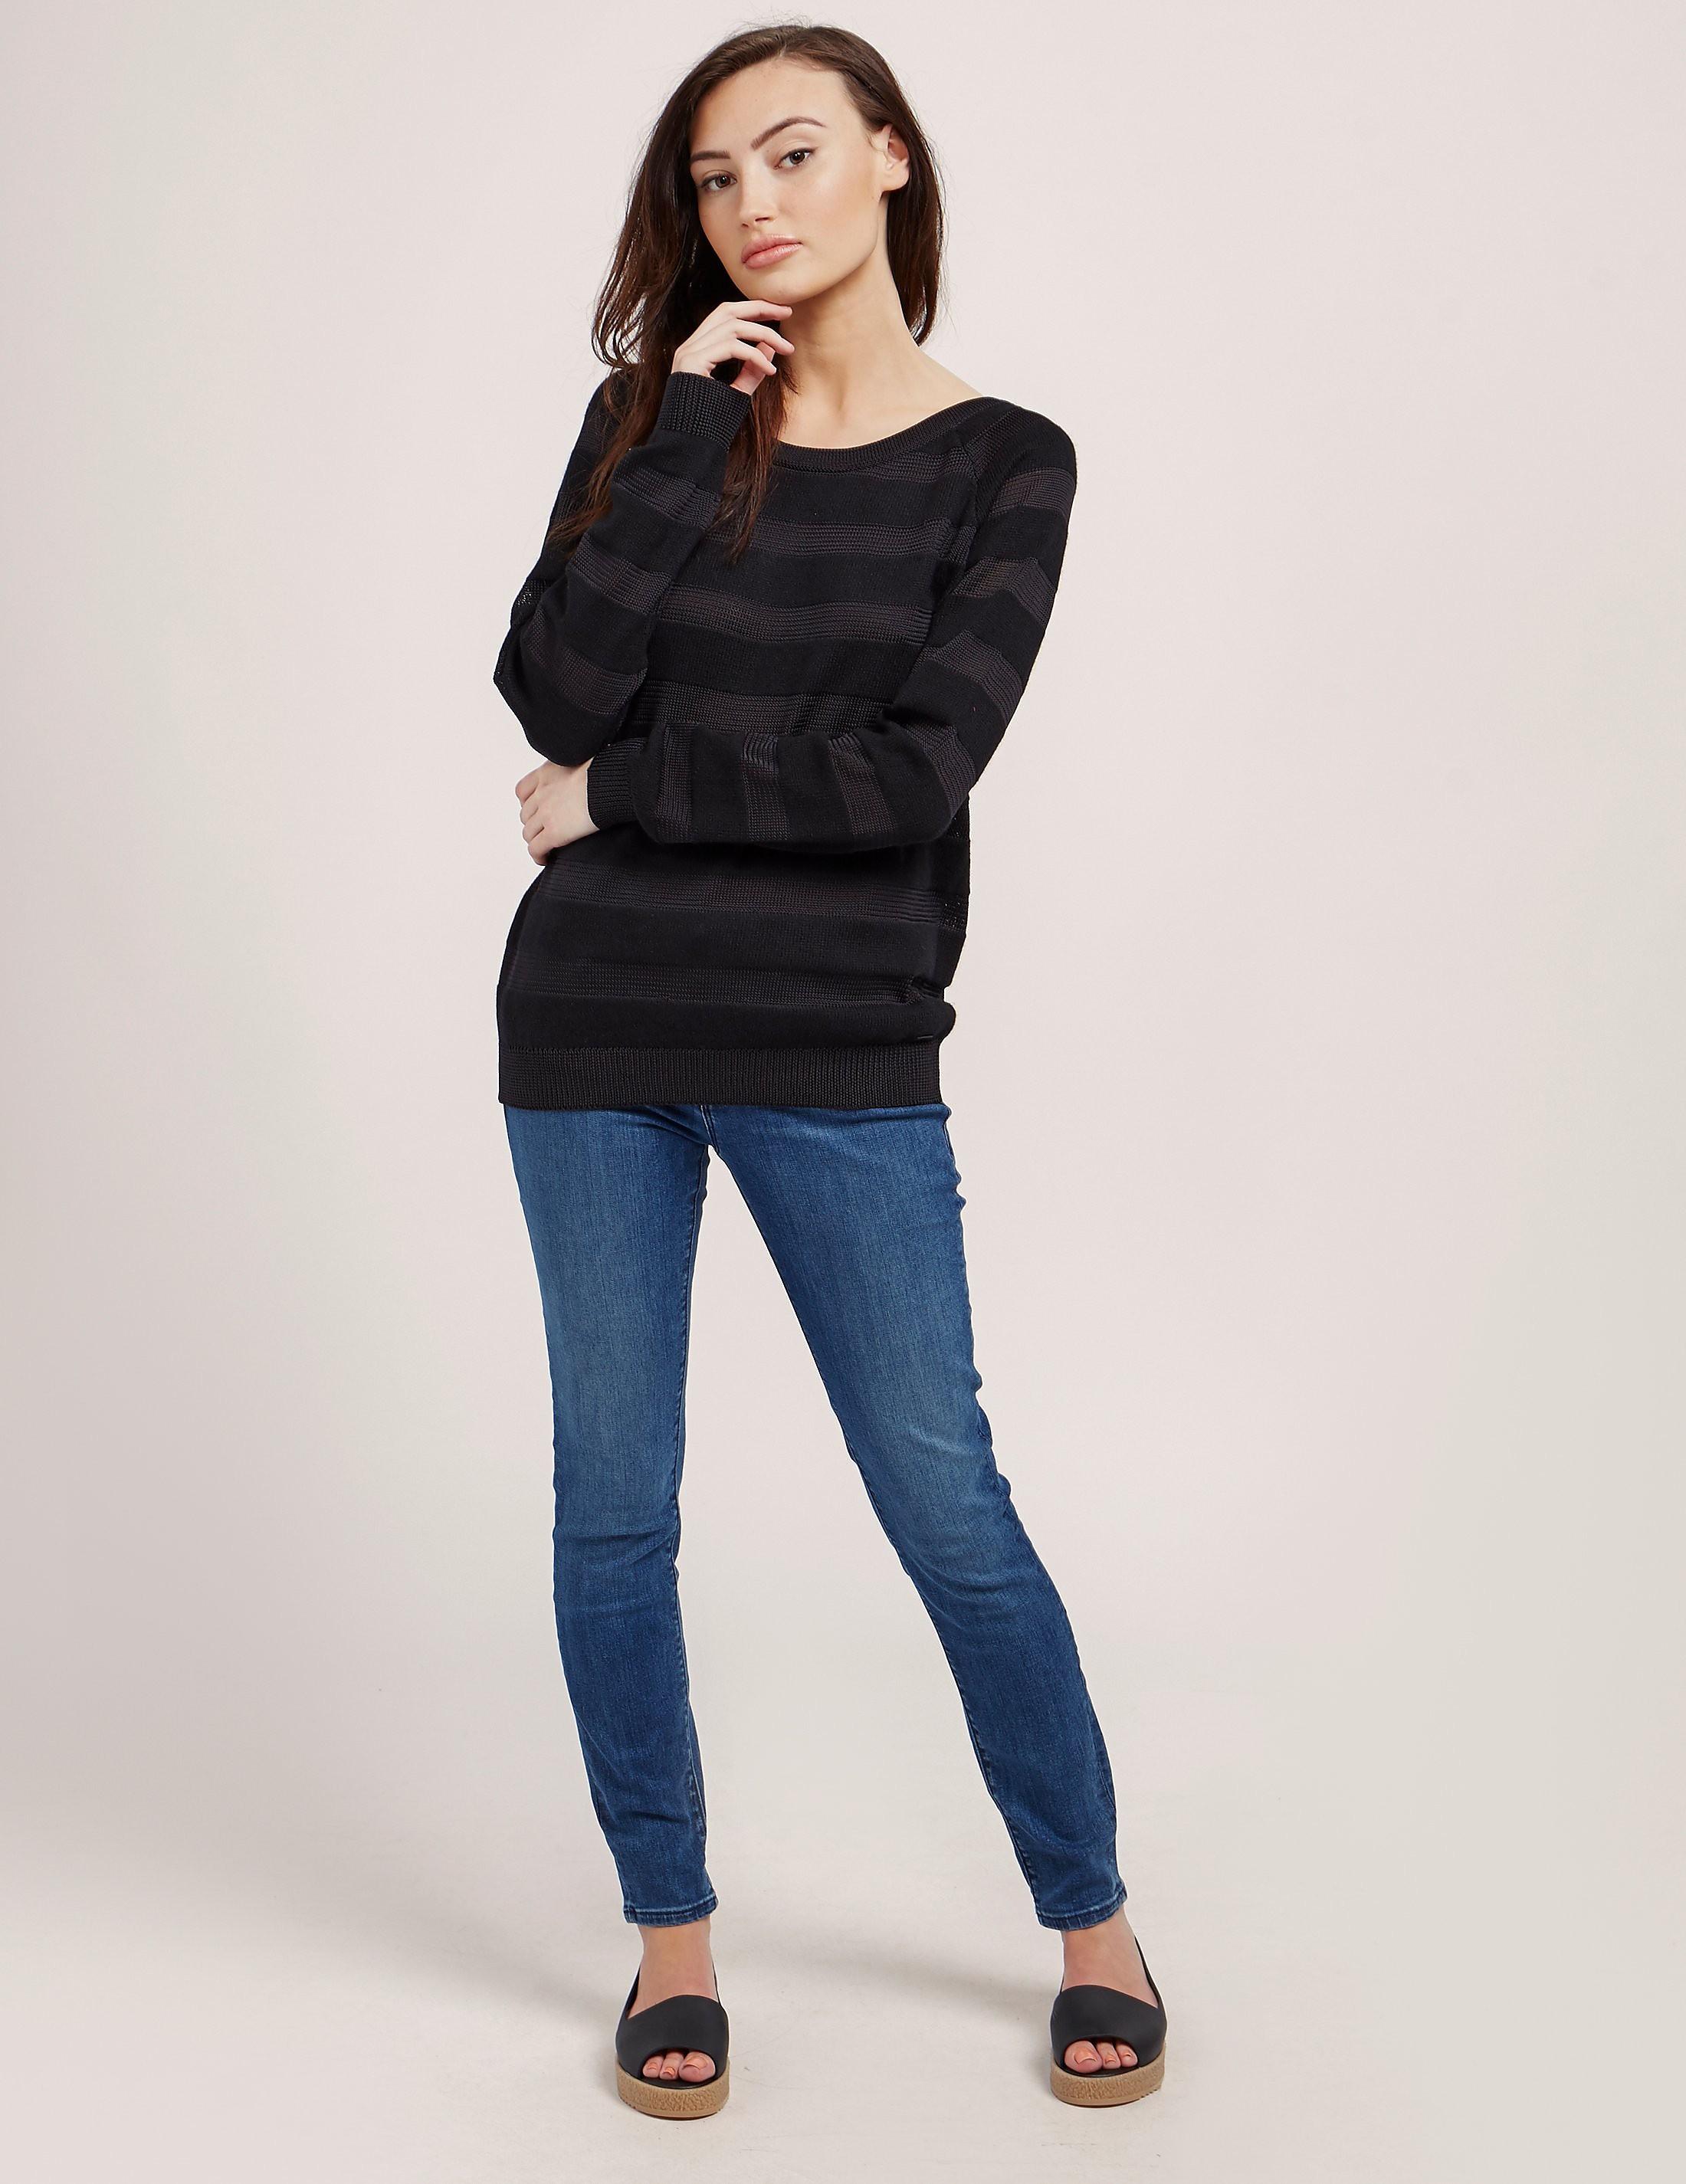 Armani Jeans Burn Out Knit